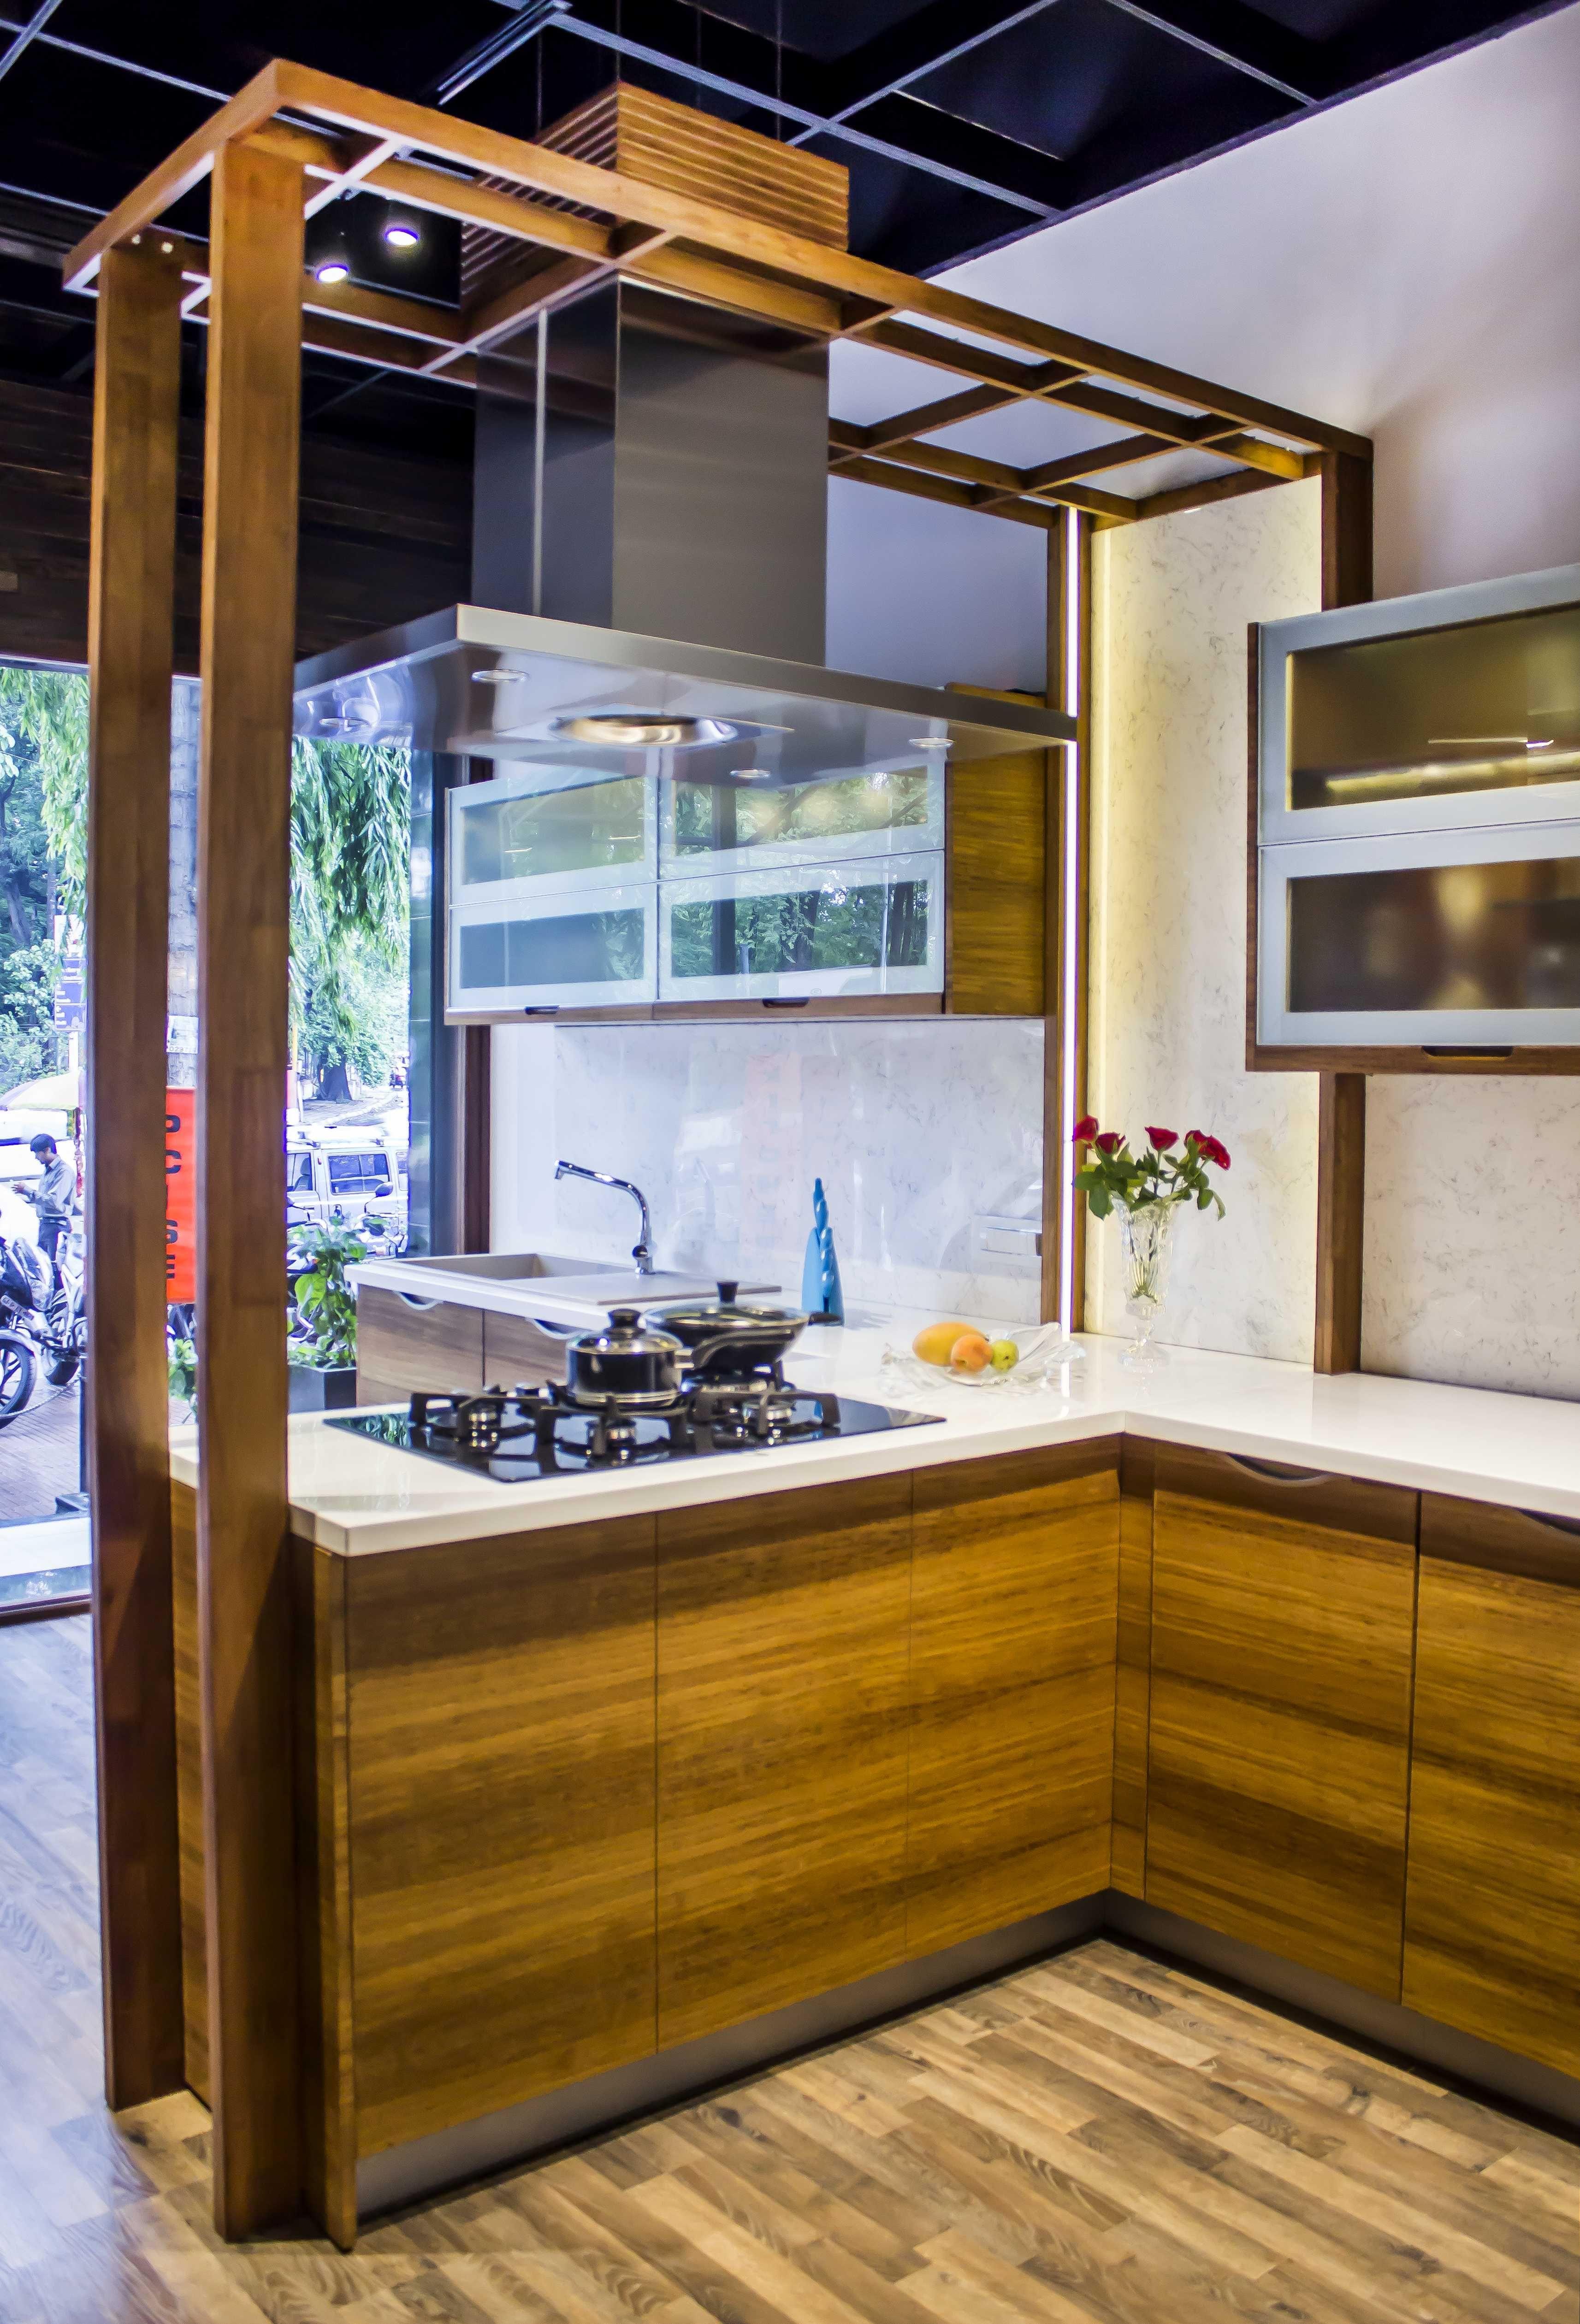 Perpendicular kitchen perpendicular kitchen poise showroom